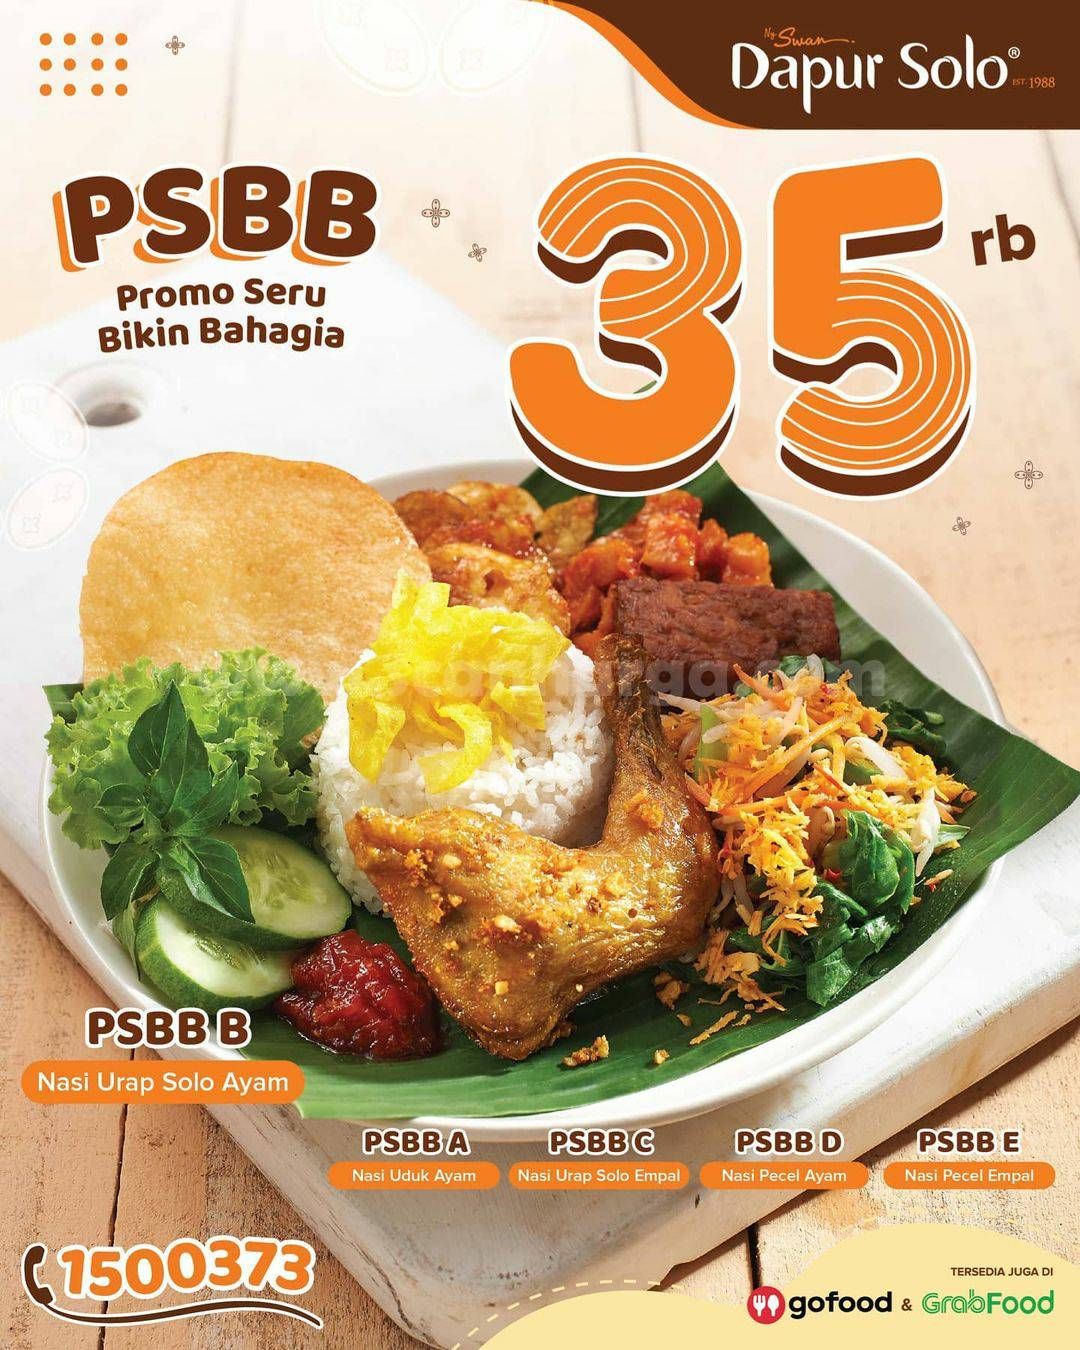 Promo DAPUR SOLO Paket PSBB Harga cuma Rp 35 Ribu melalui GrabFood & GoFood